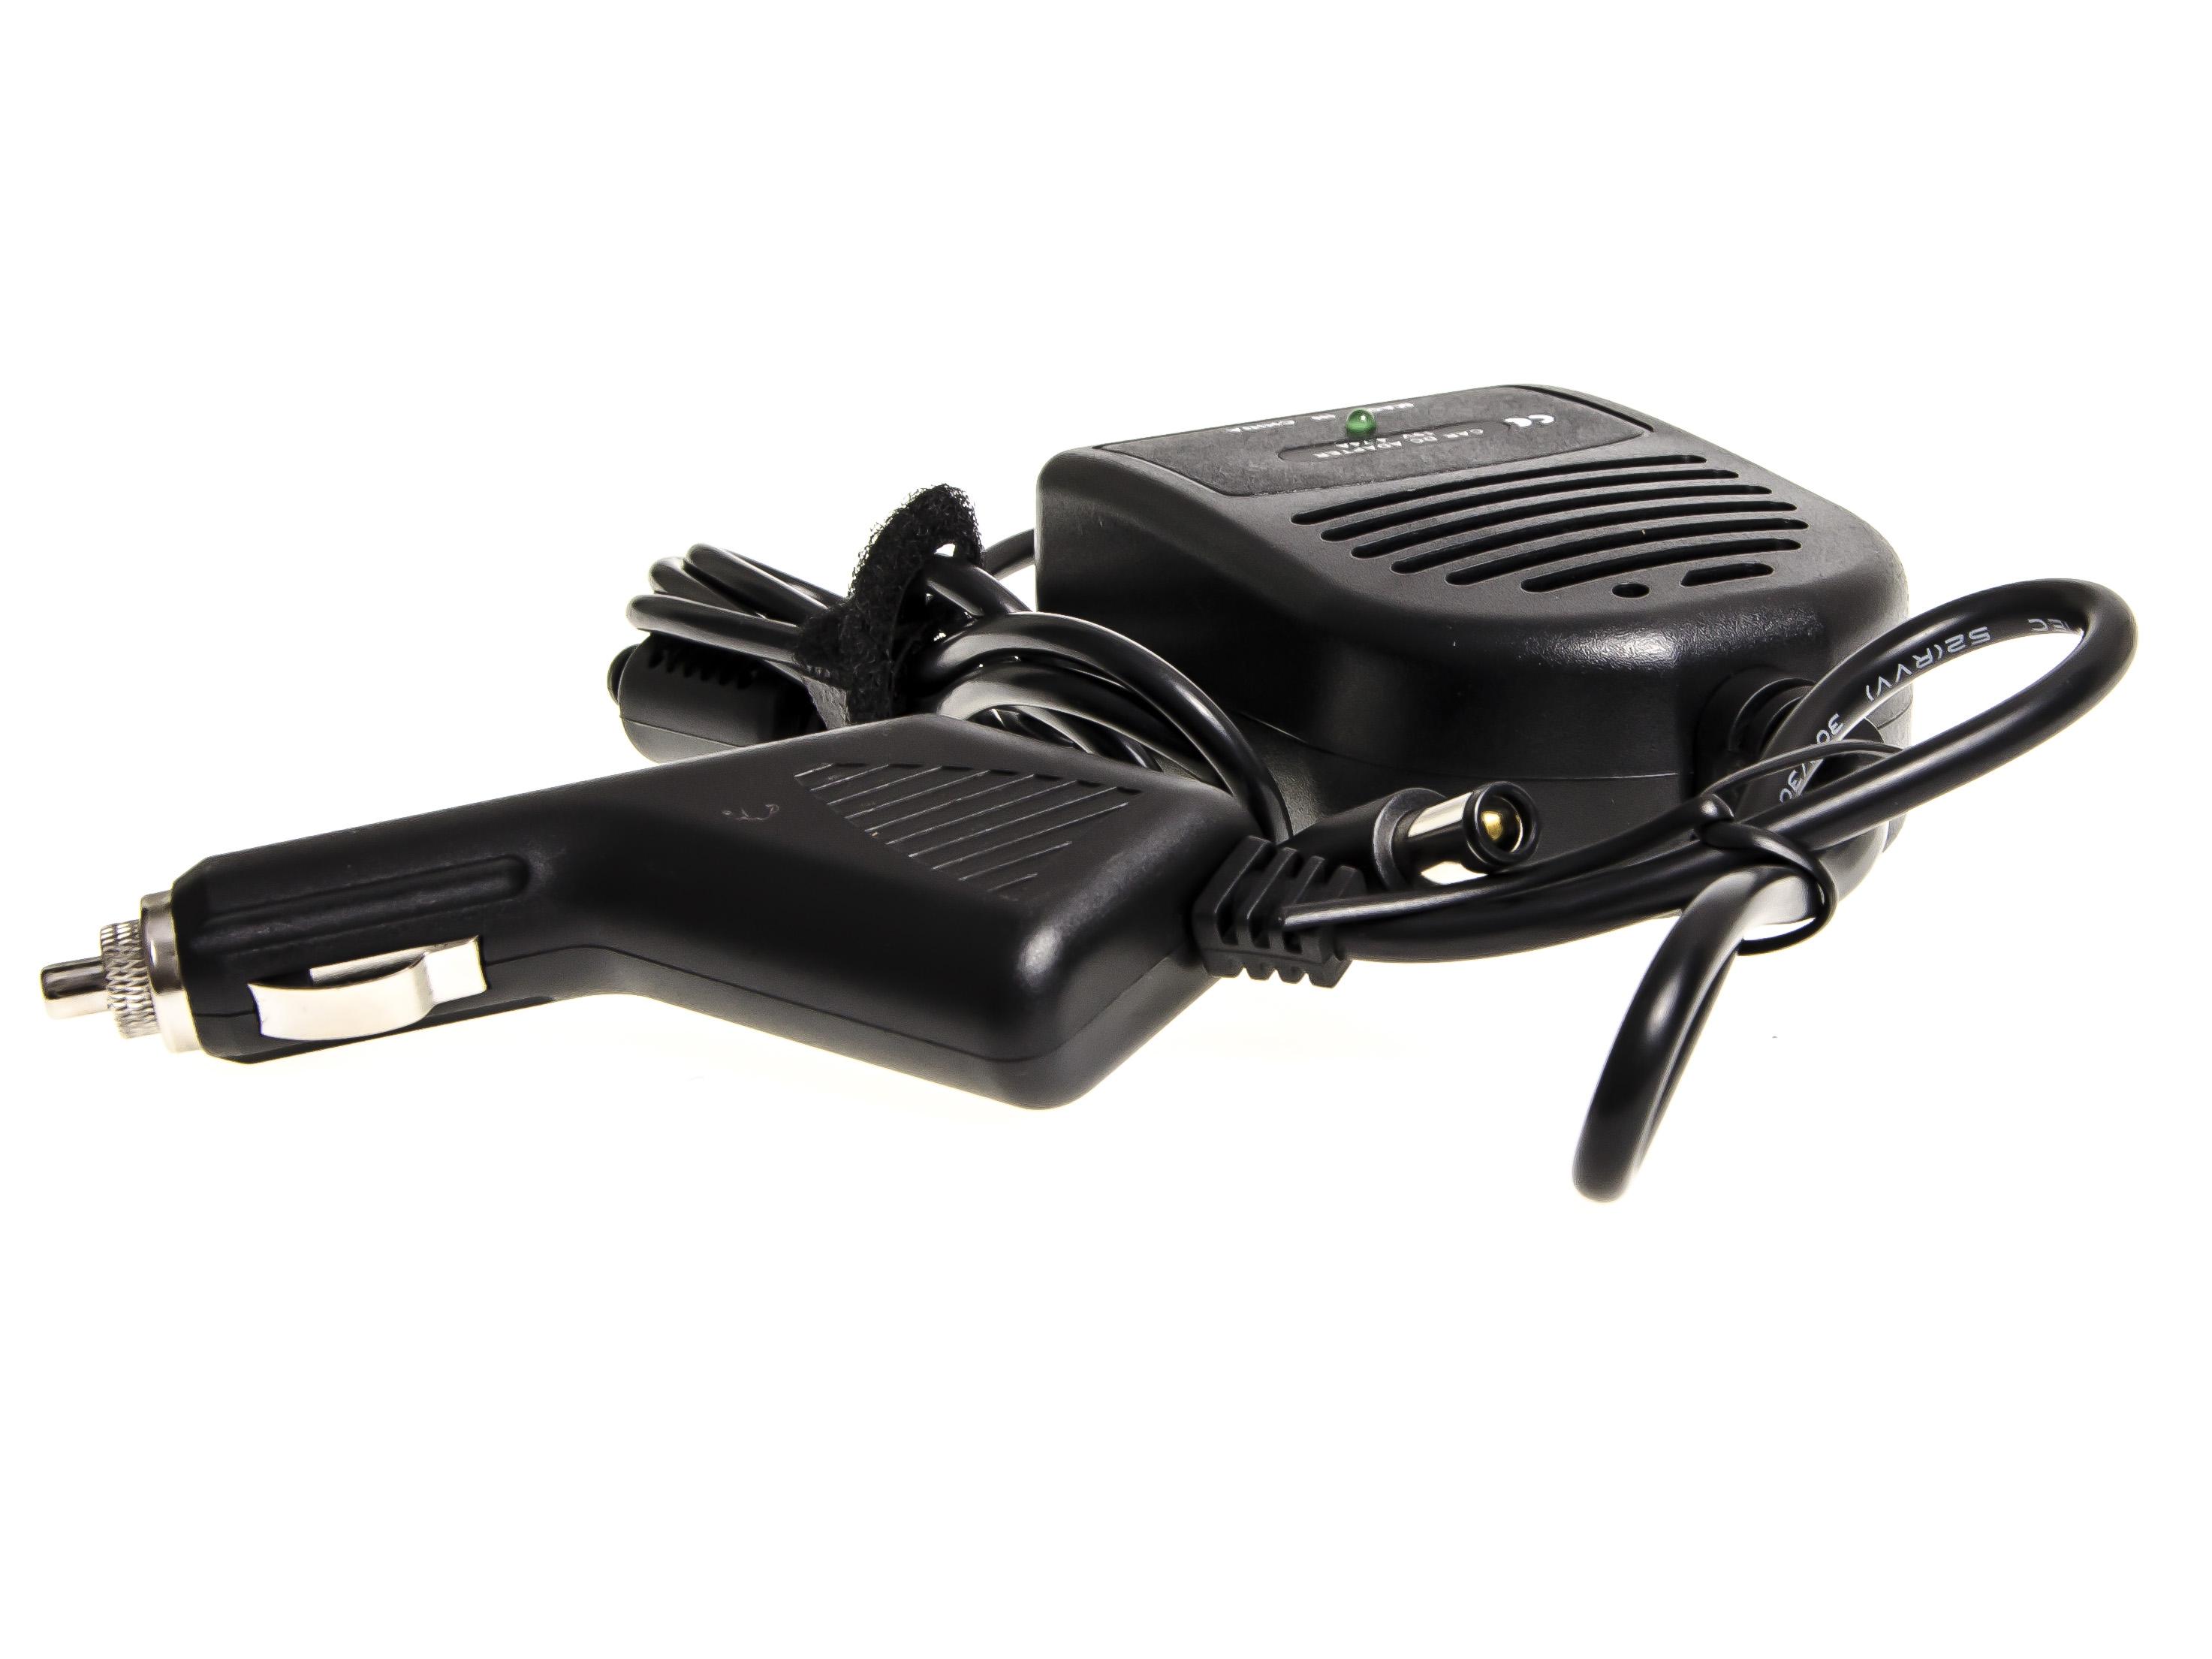 AUTO-caricabatterie-adattatore-per-HP-Compaq-Presario-cq61-315sh-cq61-315sl-Laptop